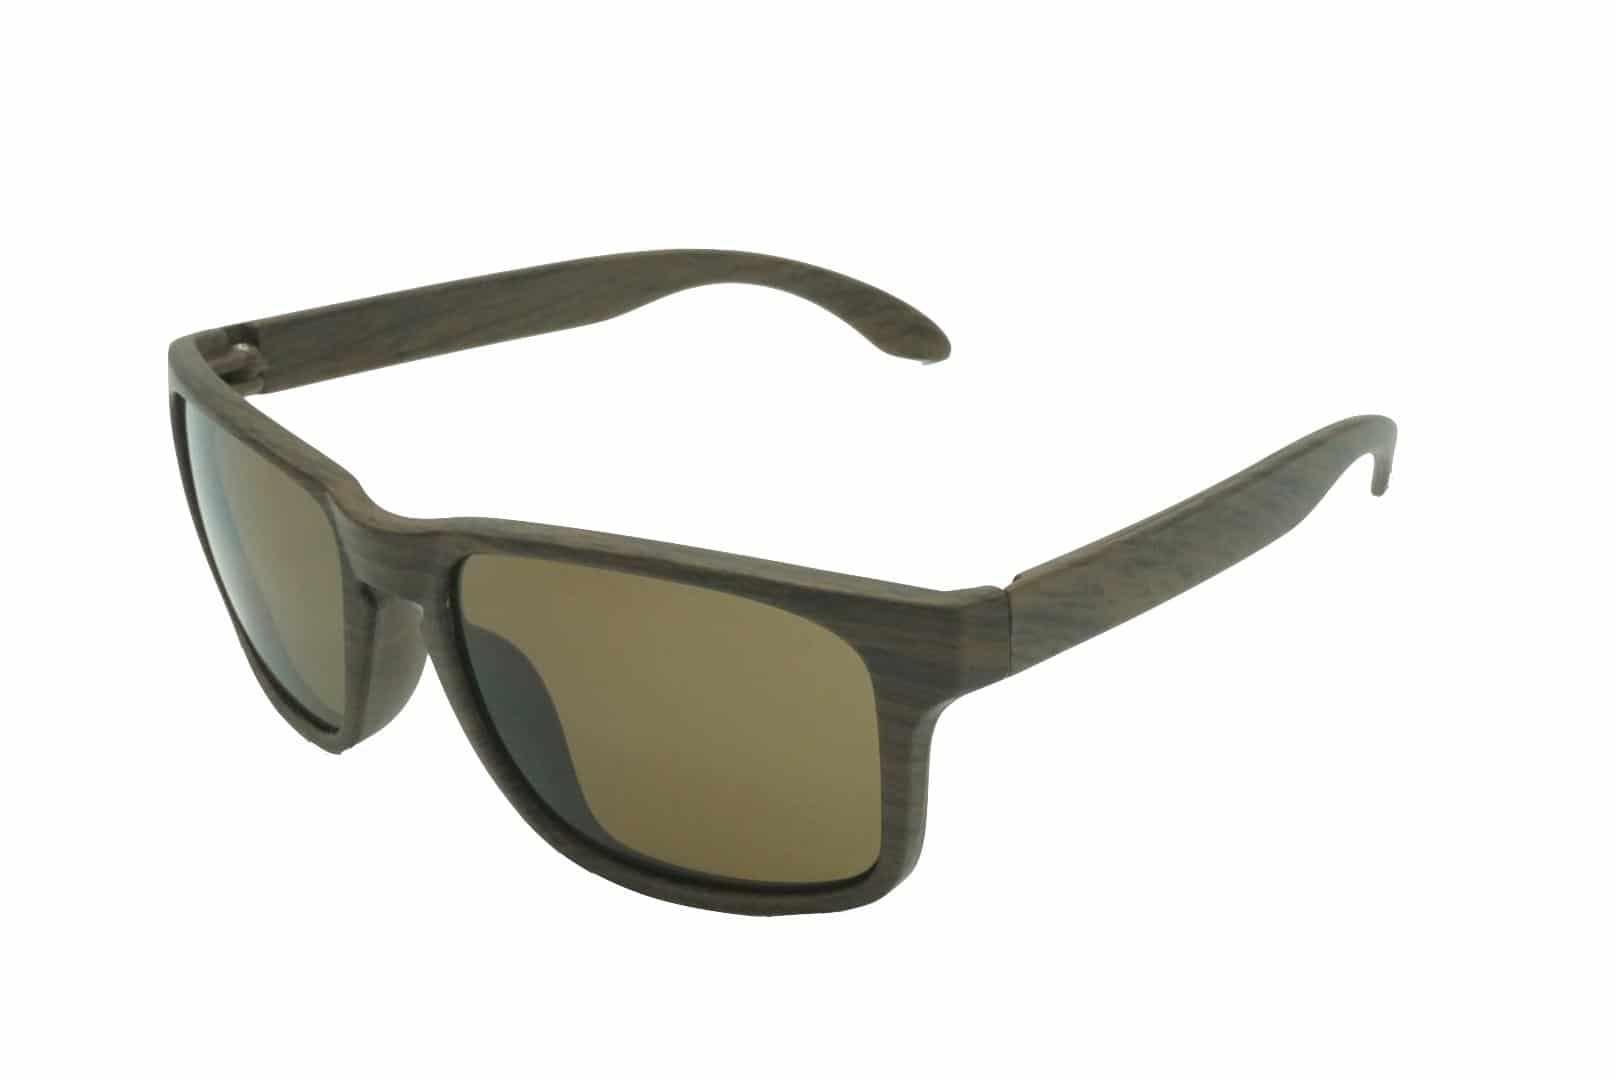 4Goodz Barcelona brown - houtlook wayfarer zonnebril - Bruin - Uv400